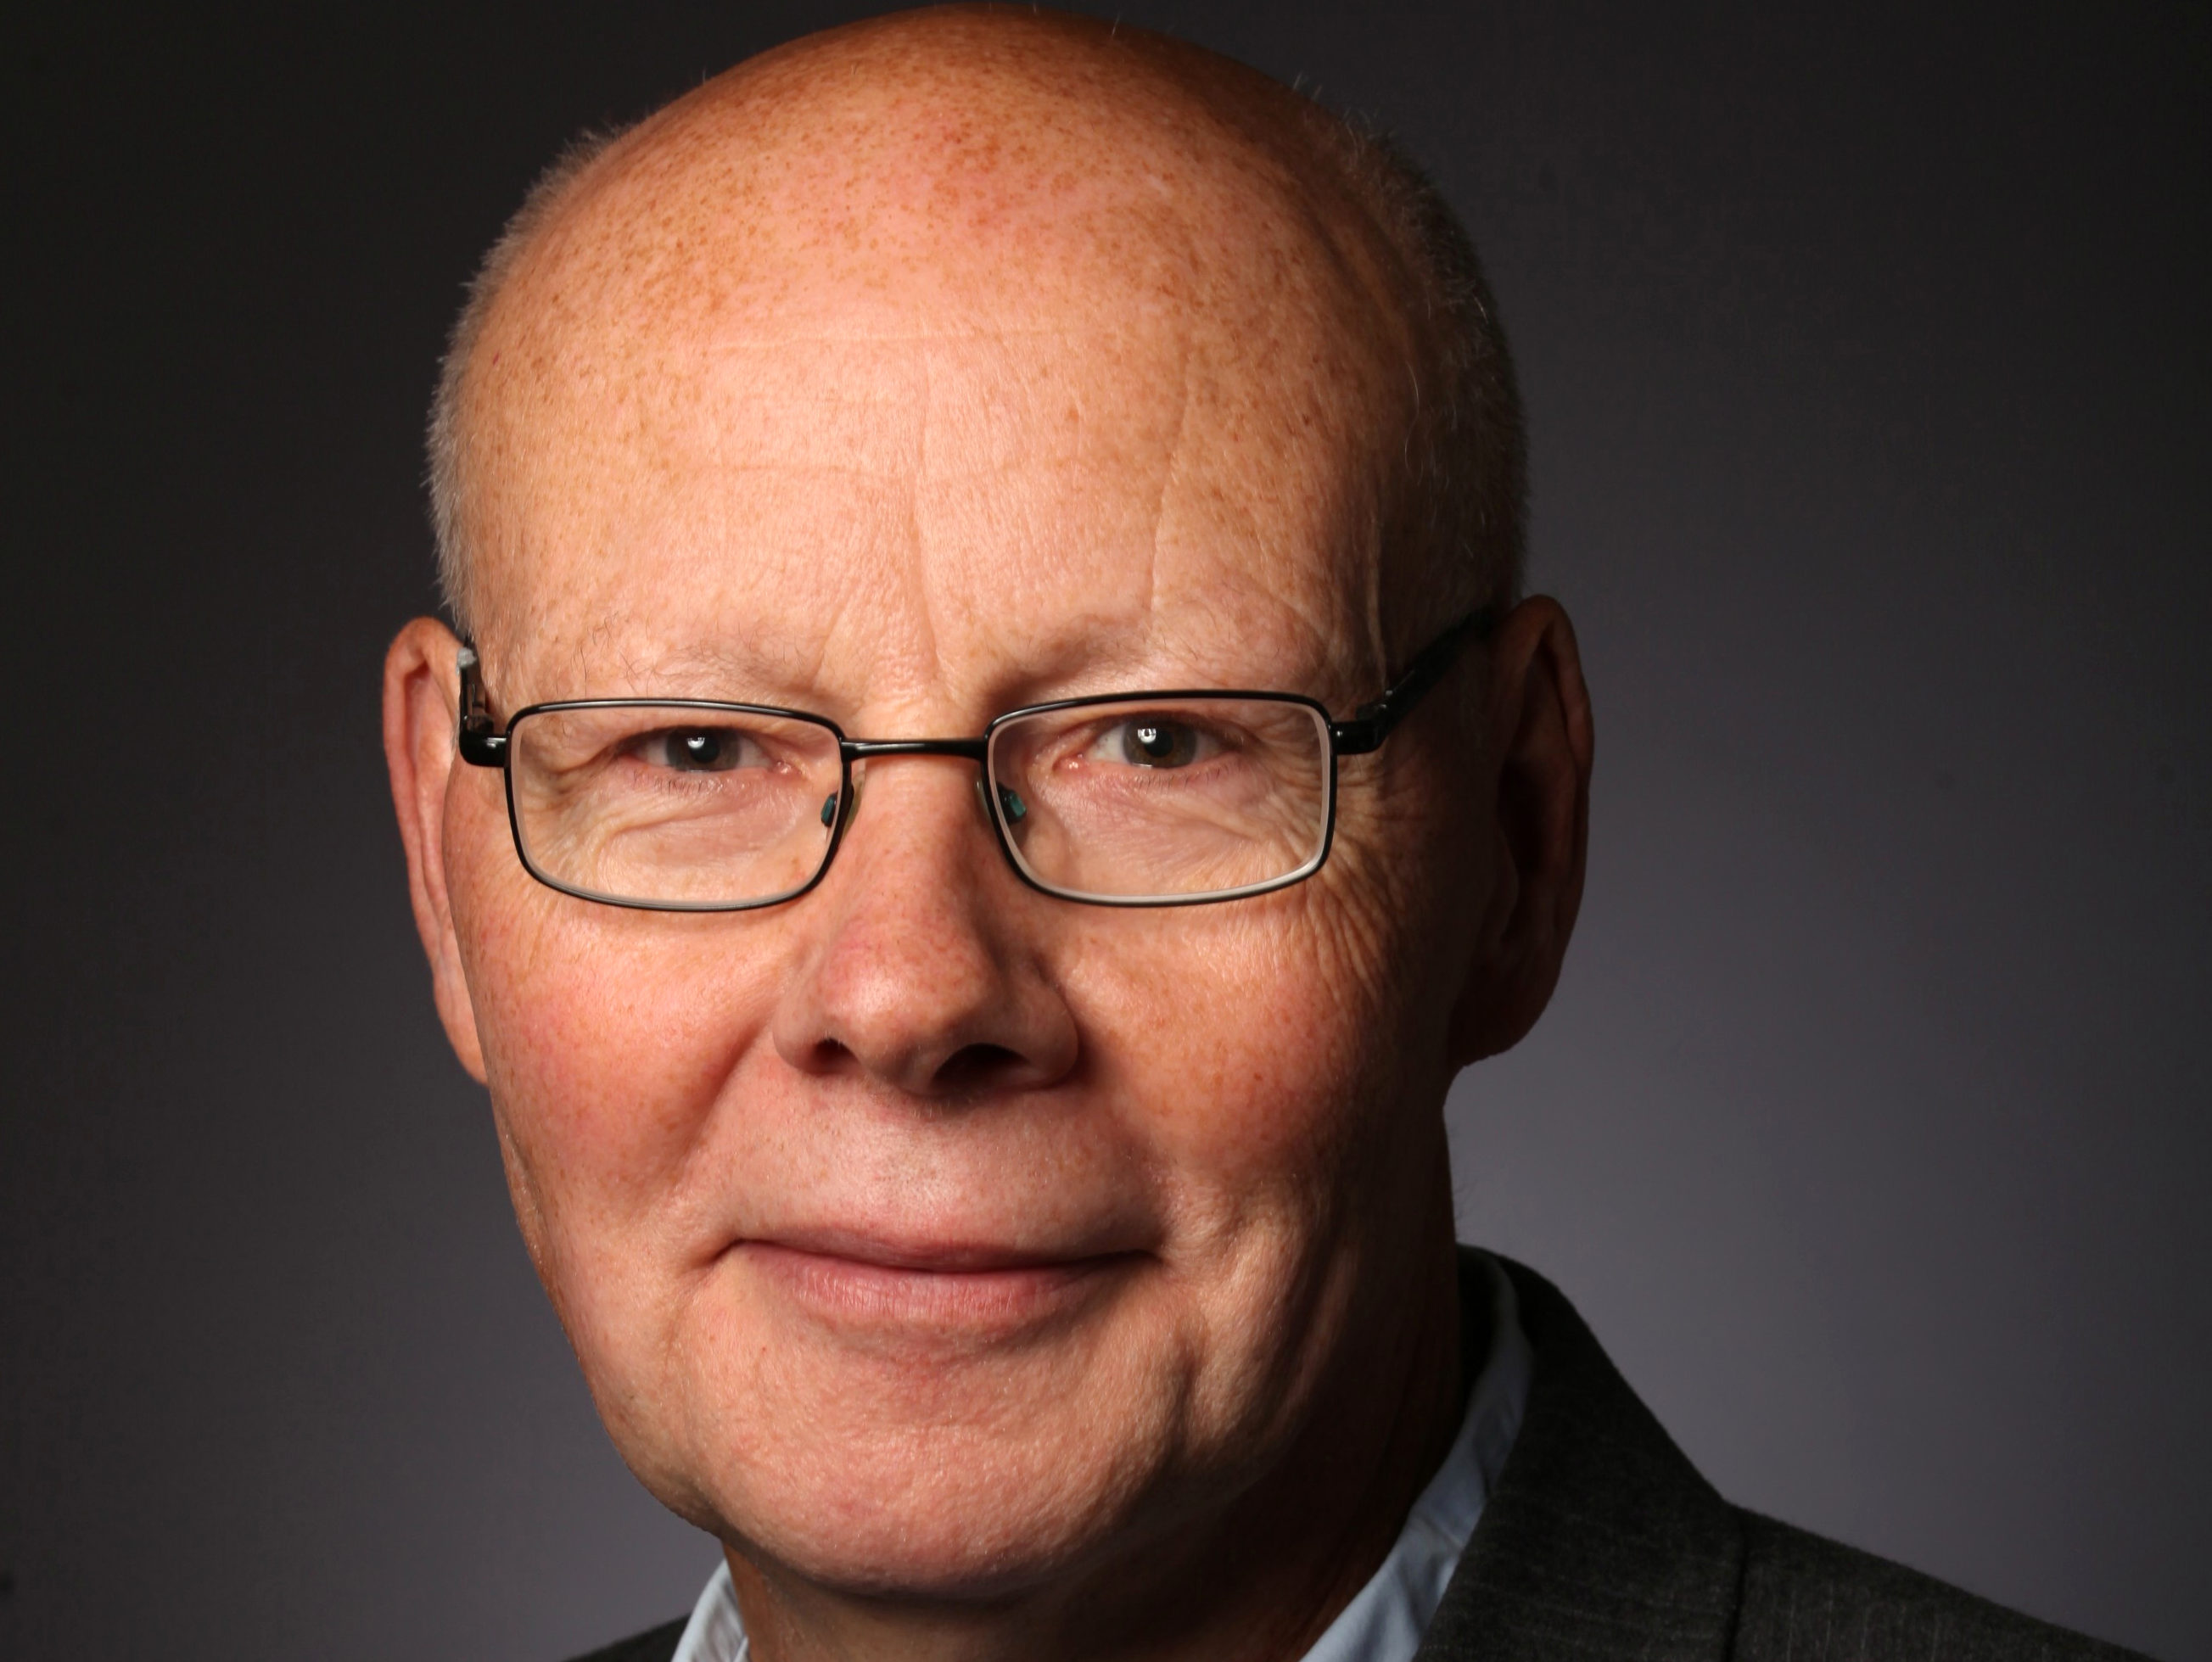 Prof. Dr. Rainer Bromme